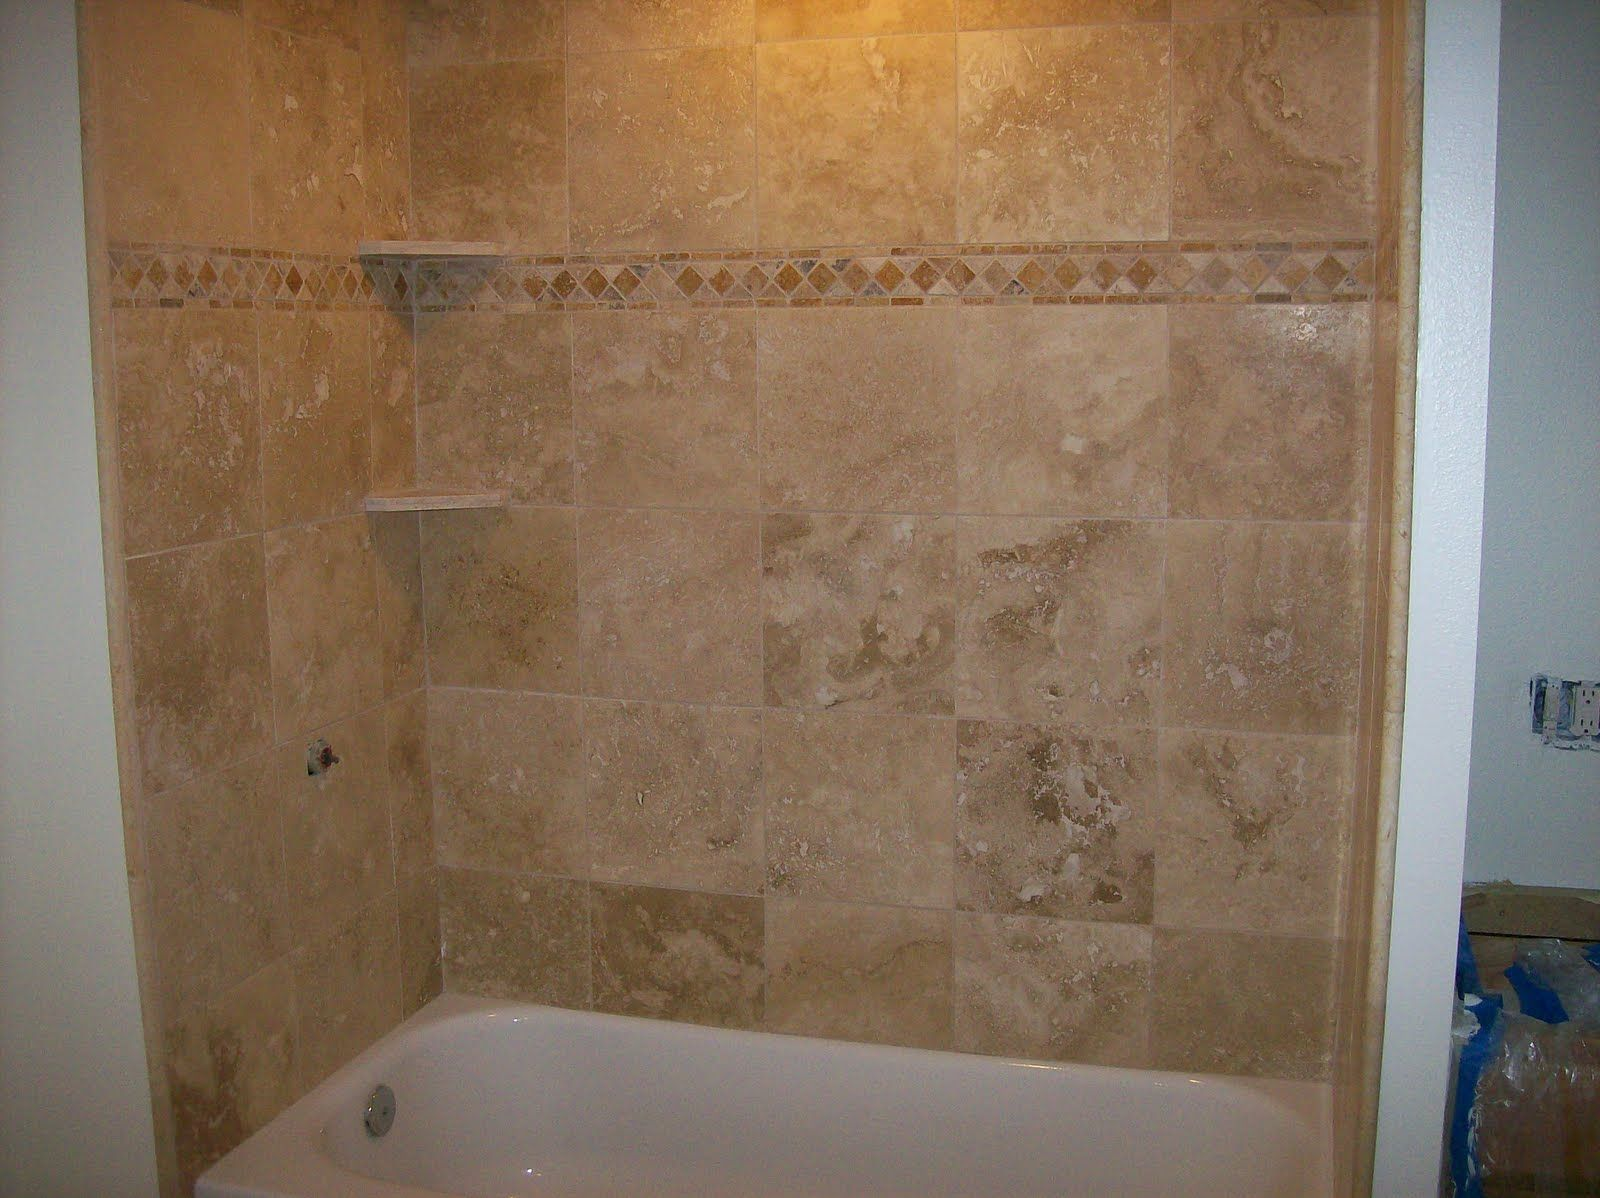 Tile Bathtub Surround Bathroom Interior Killer Ideas For Bathroom Decoration With Cream Travertine Tile Bath Surround Along With Travertine Bathroom Corner